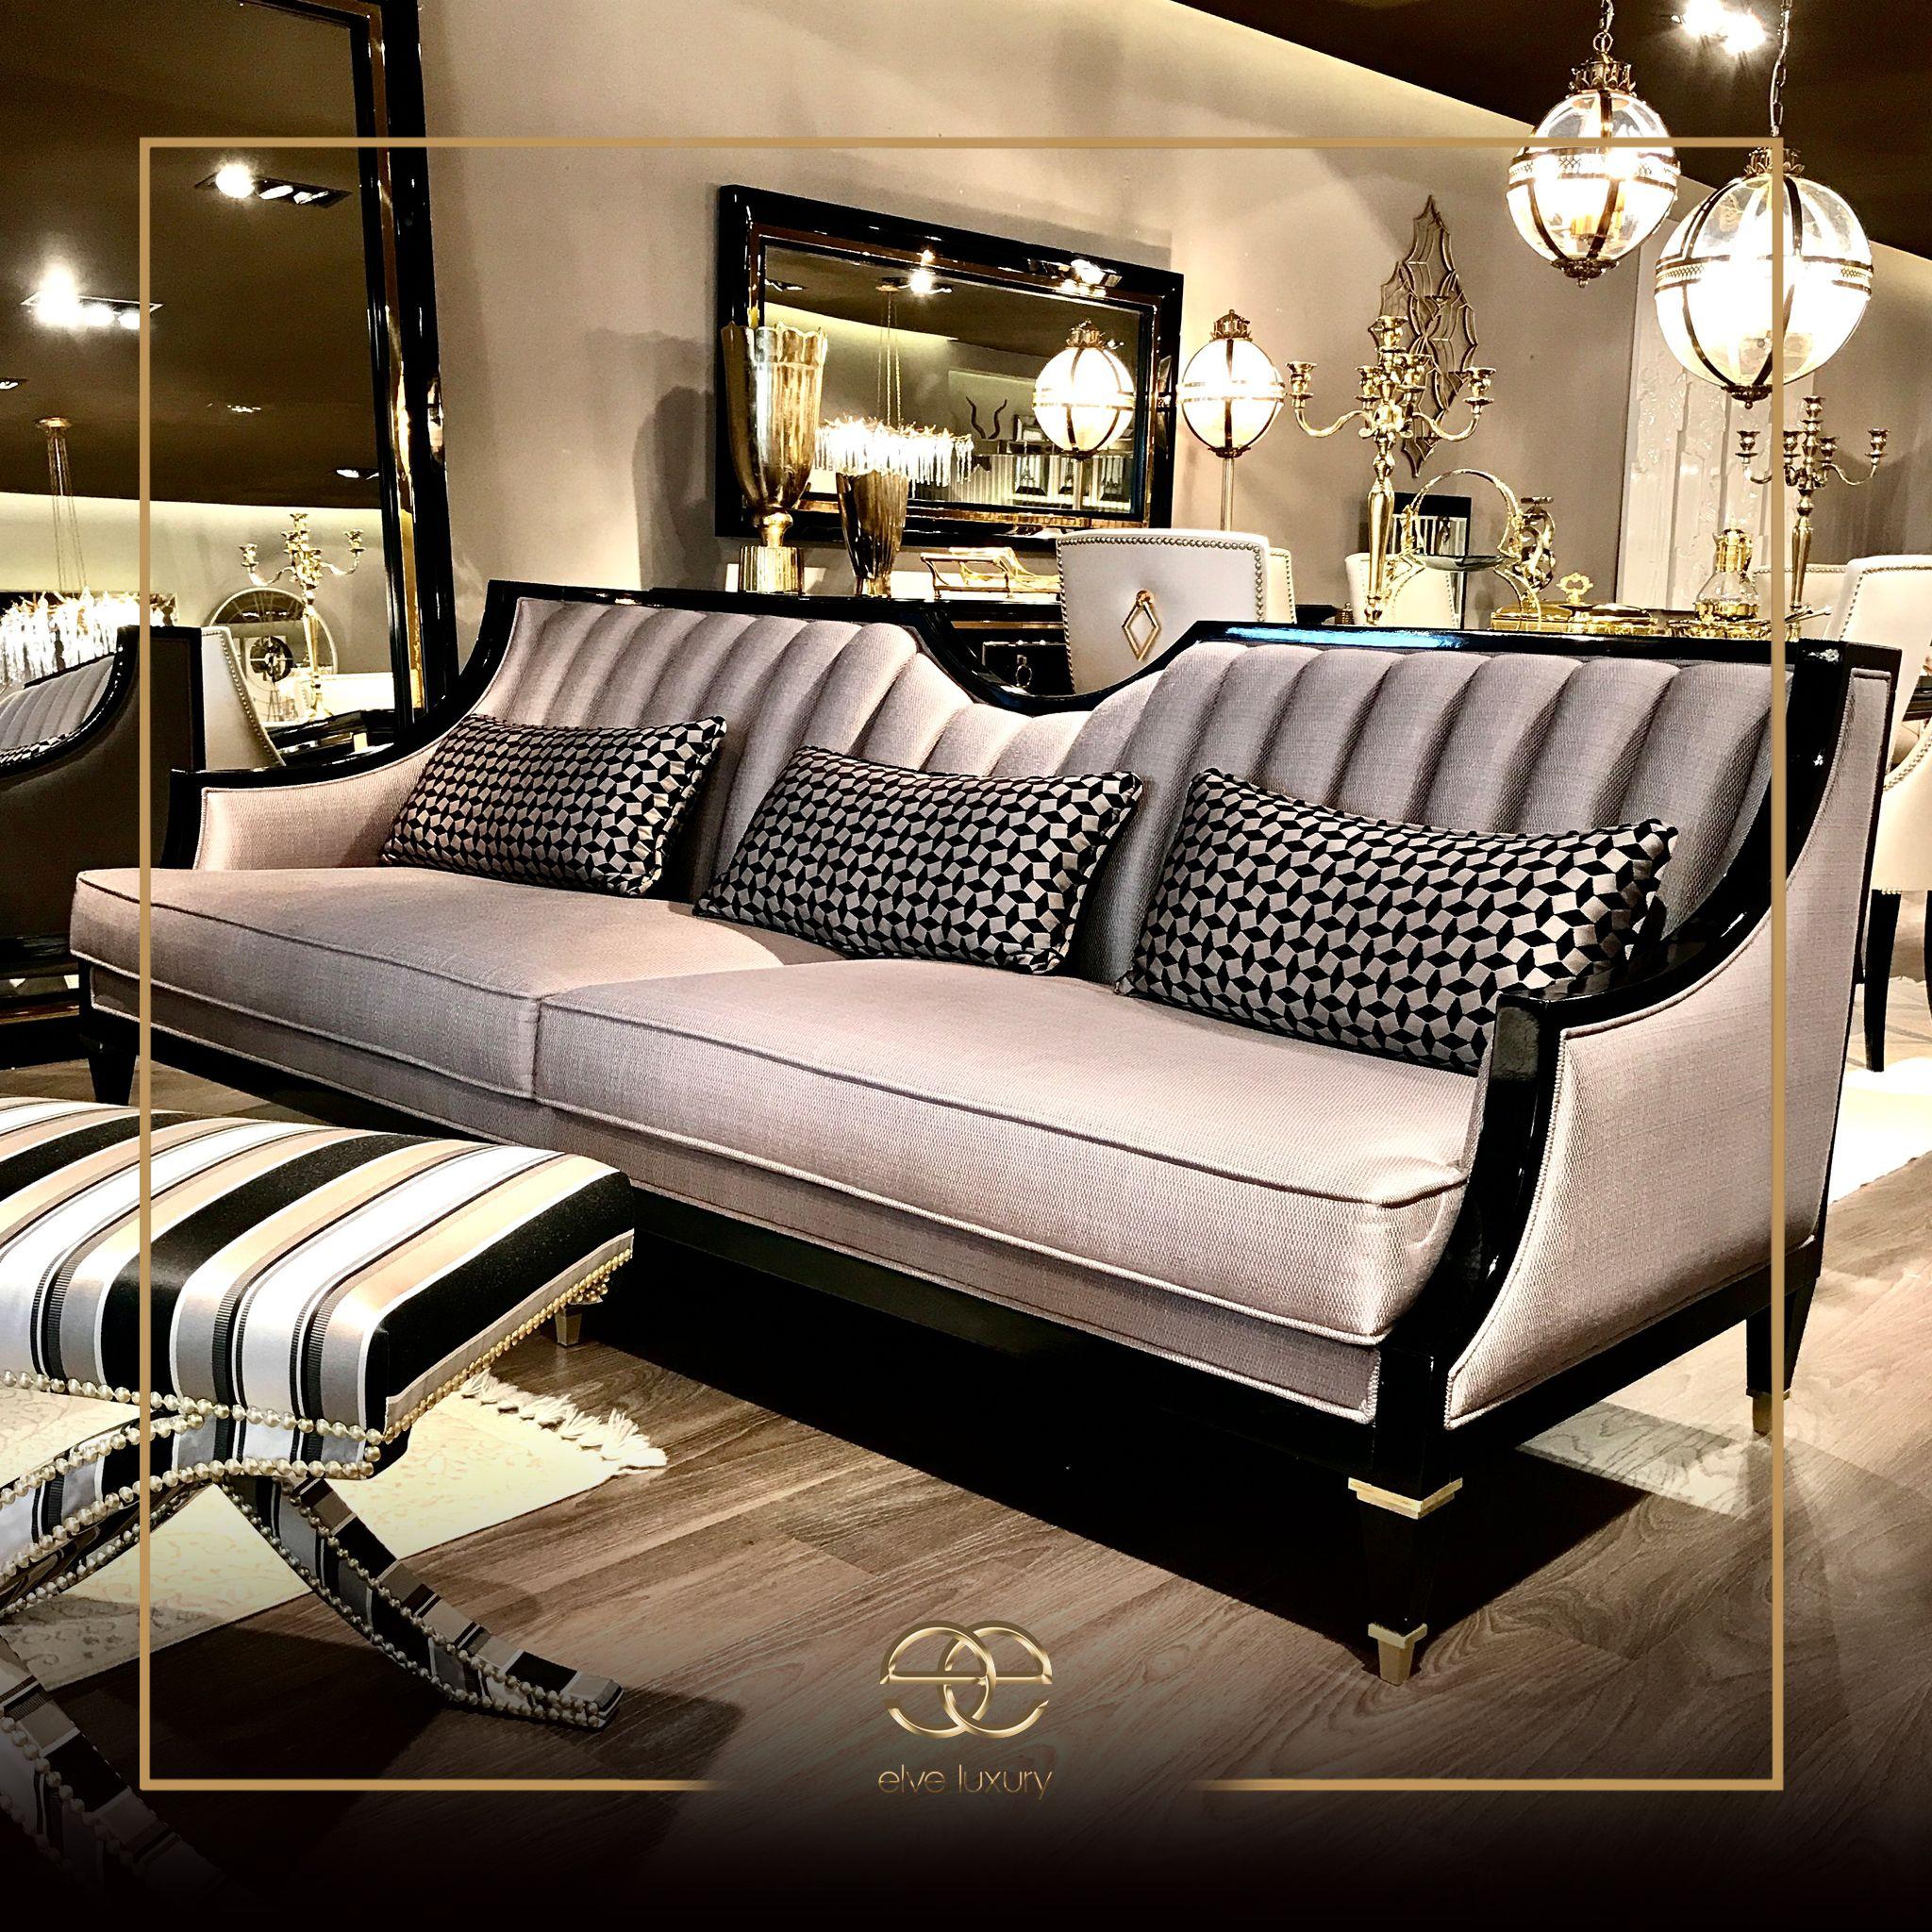 Pin By Saika Yesmine On Sofa Luxury Furniture Sofa Upscale Furniture Luxury Sofa